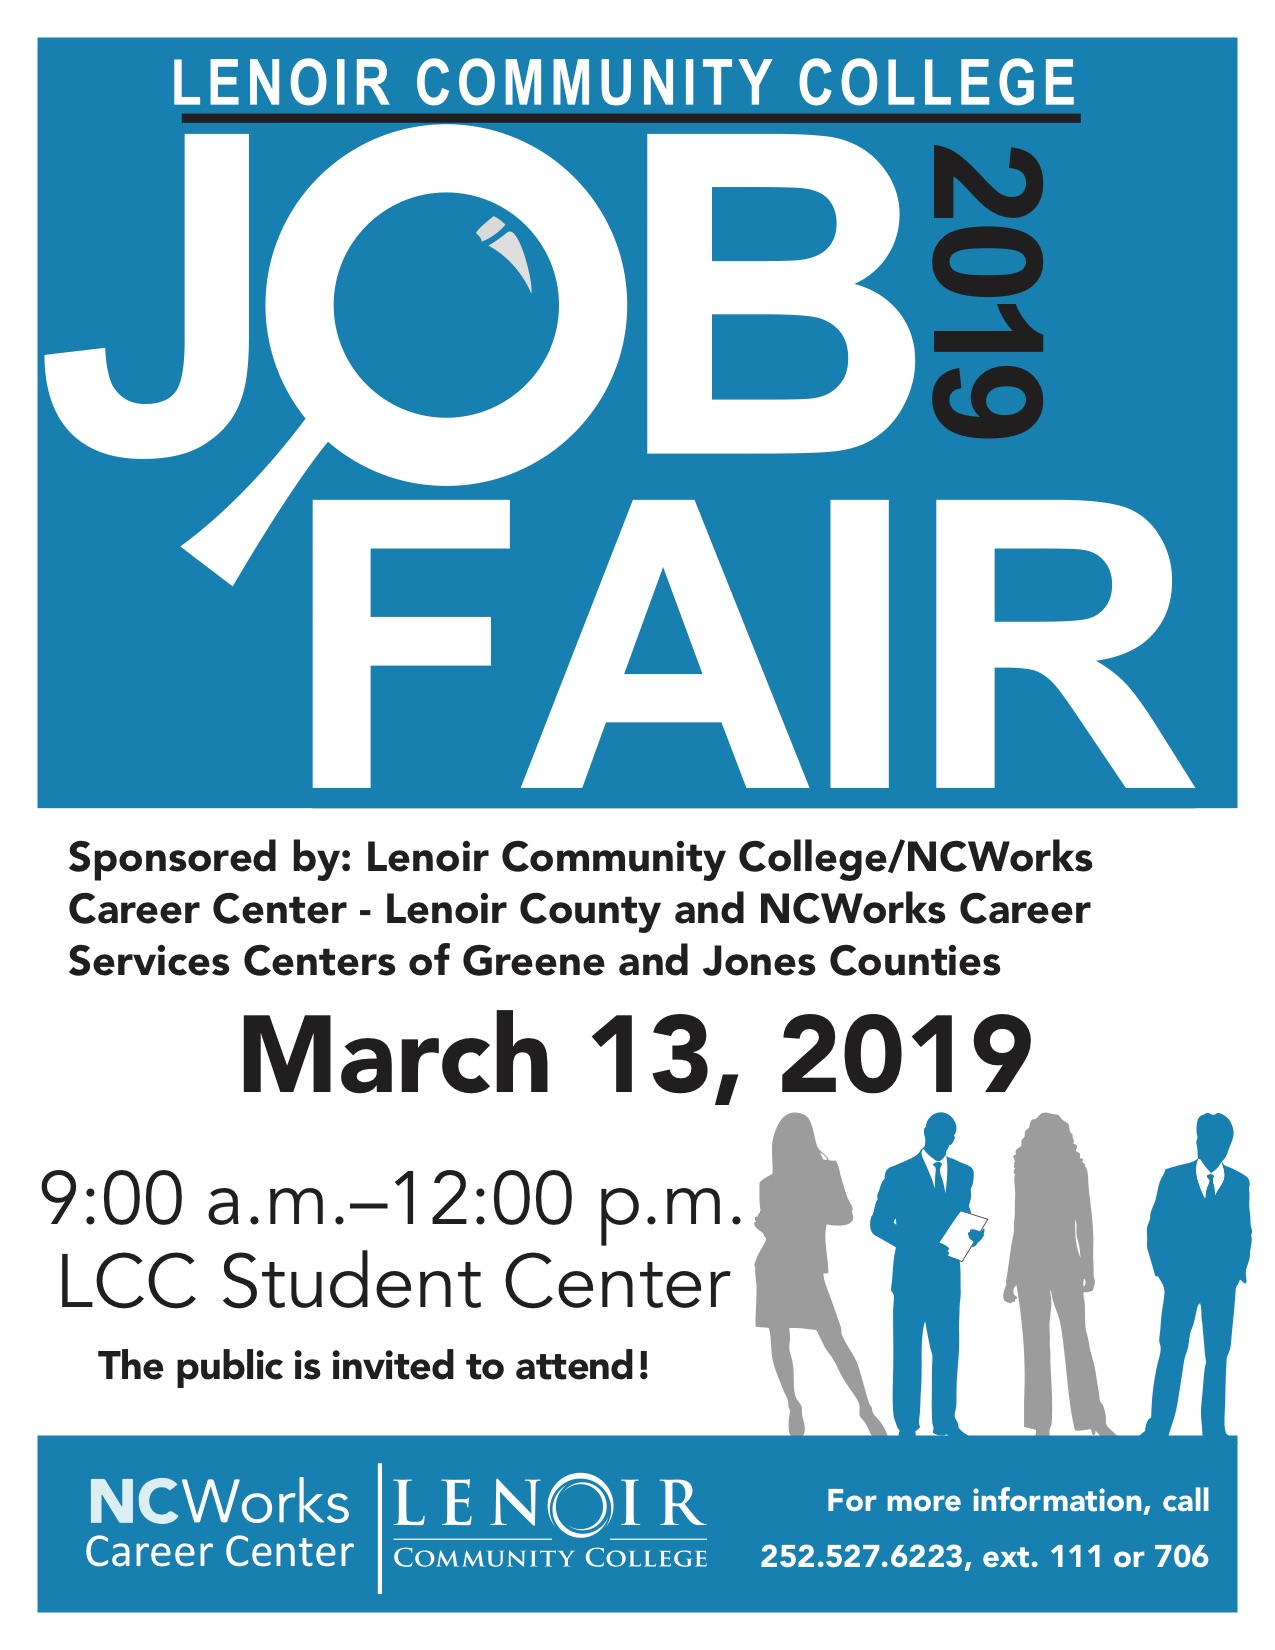 Job Fair Flyer 2019.jpg